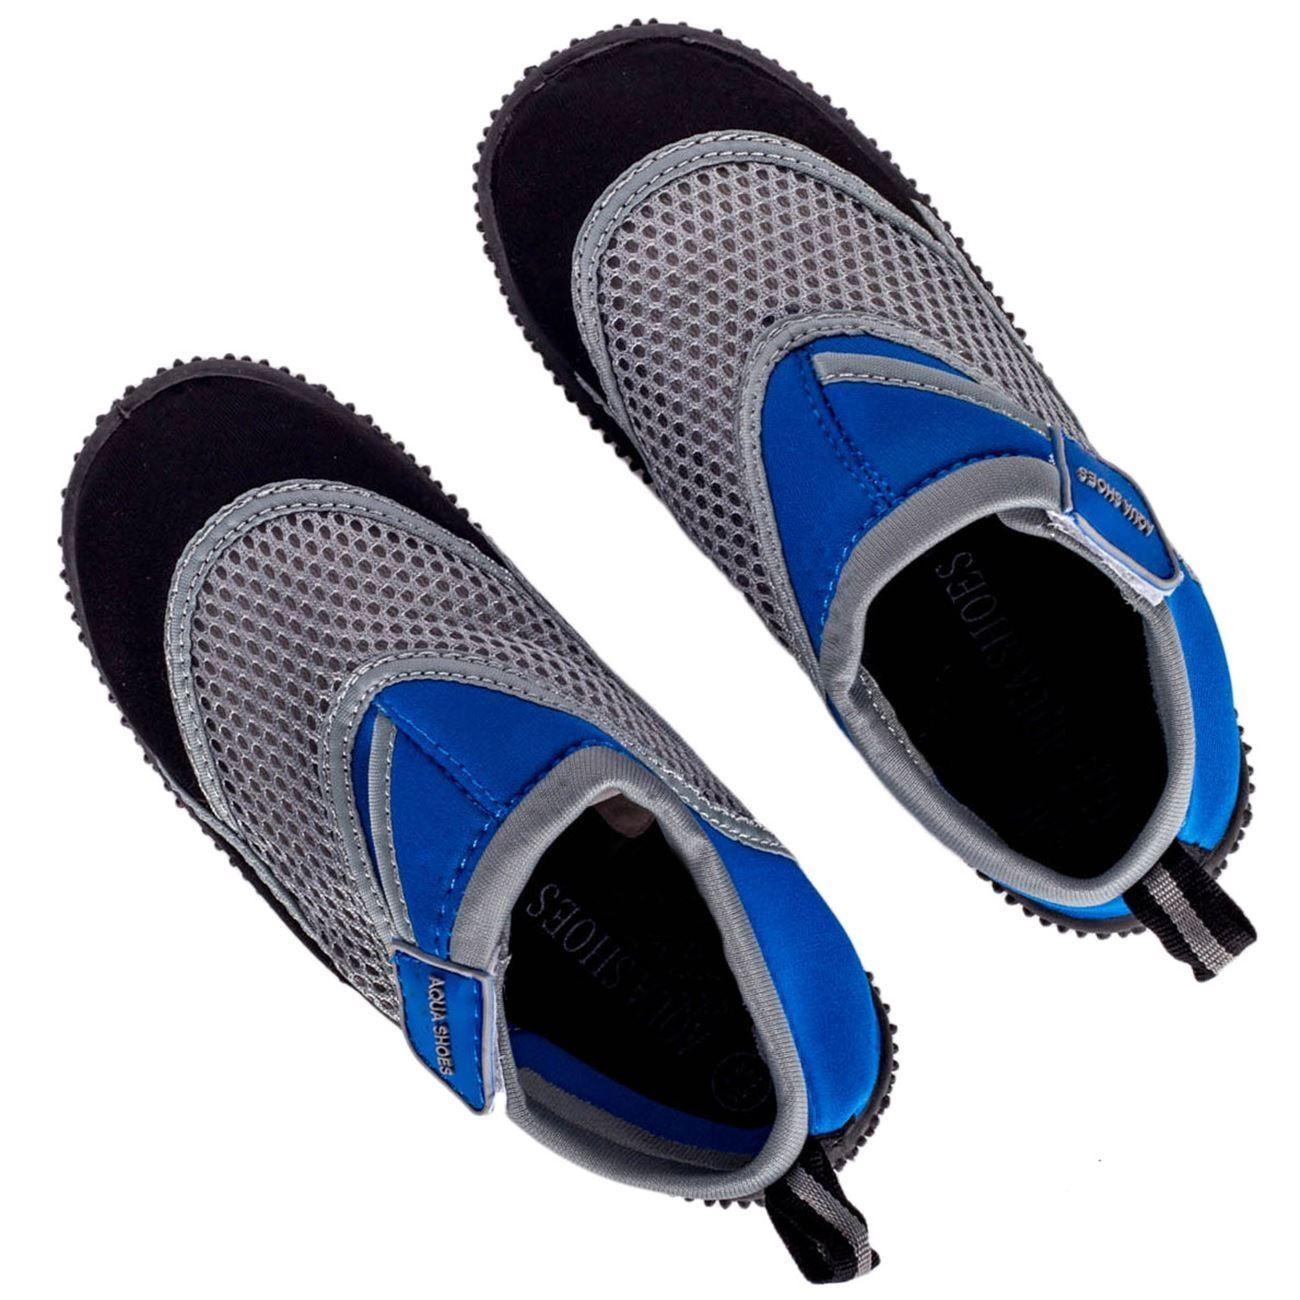 26a6c2a8a03 Παπούτσια Θαλάσσης Μπλε Γκρι < Παπούτσια Θαλάσσης Preschool για ...